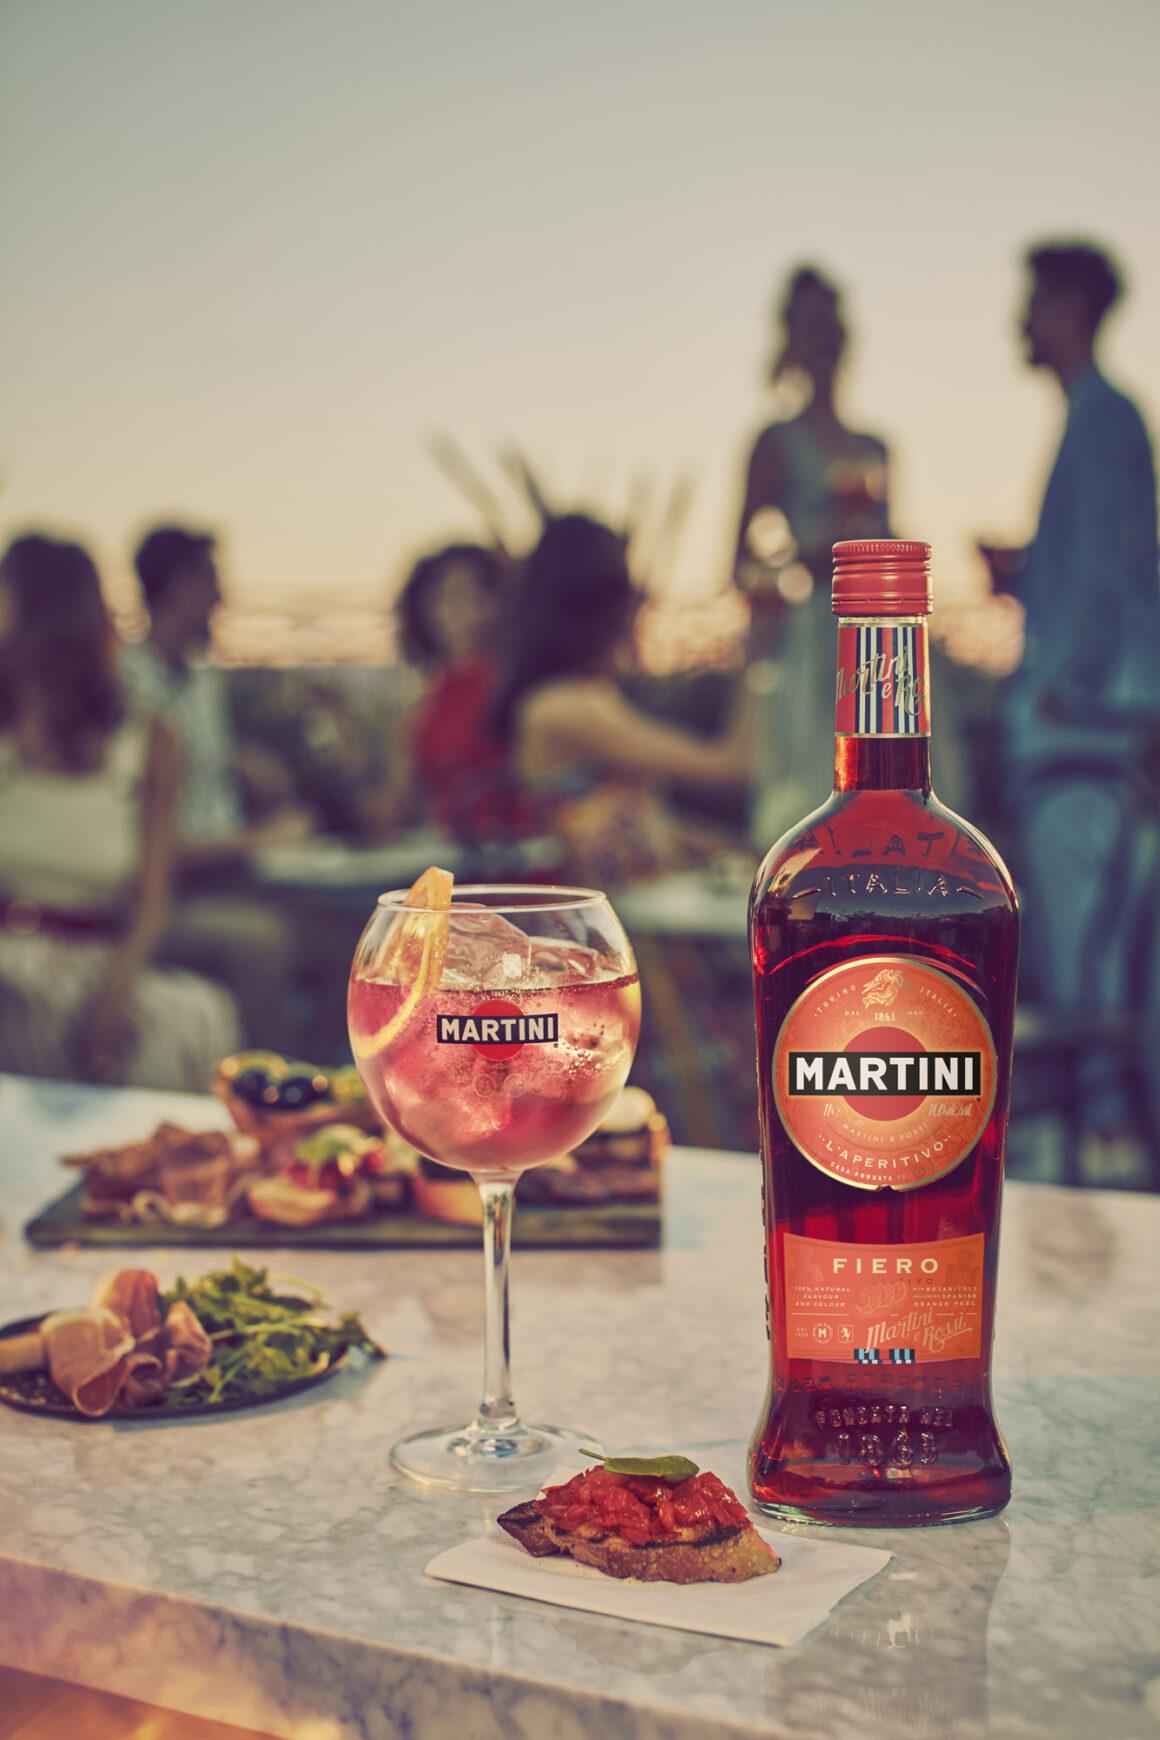 Tips on pre-batching alfresco cocktails - MARTINI Fiero